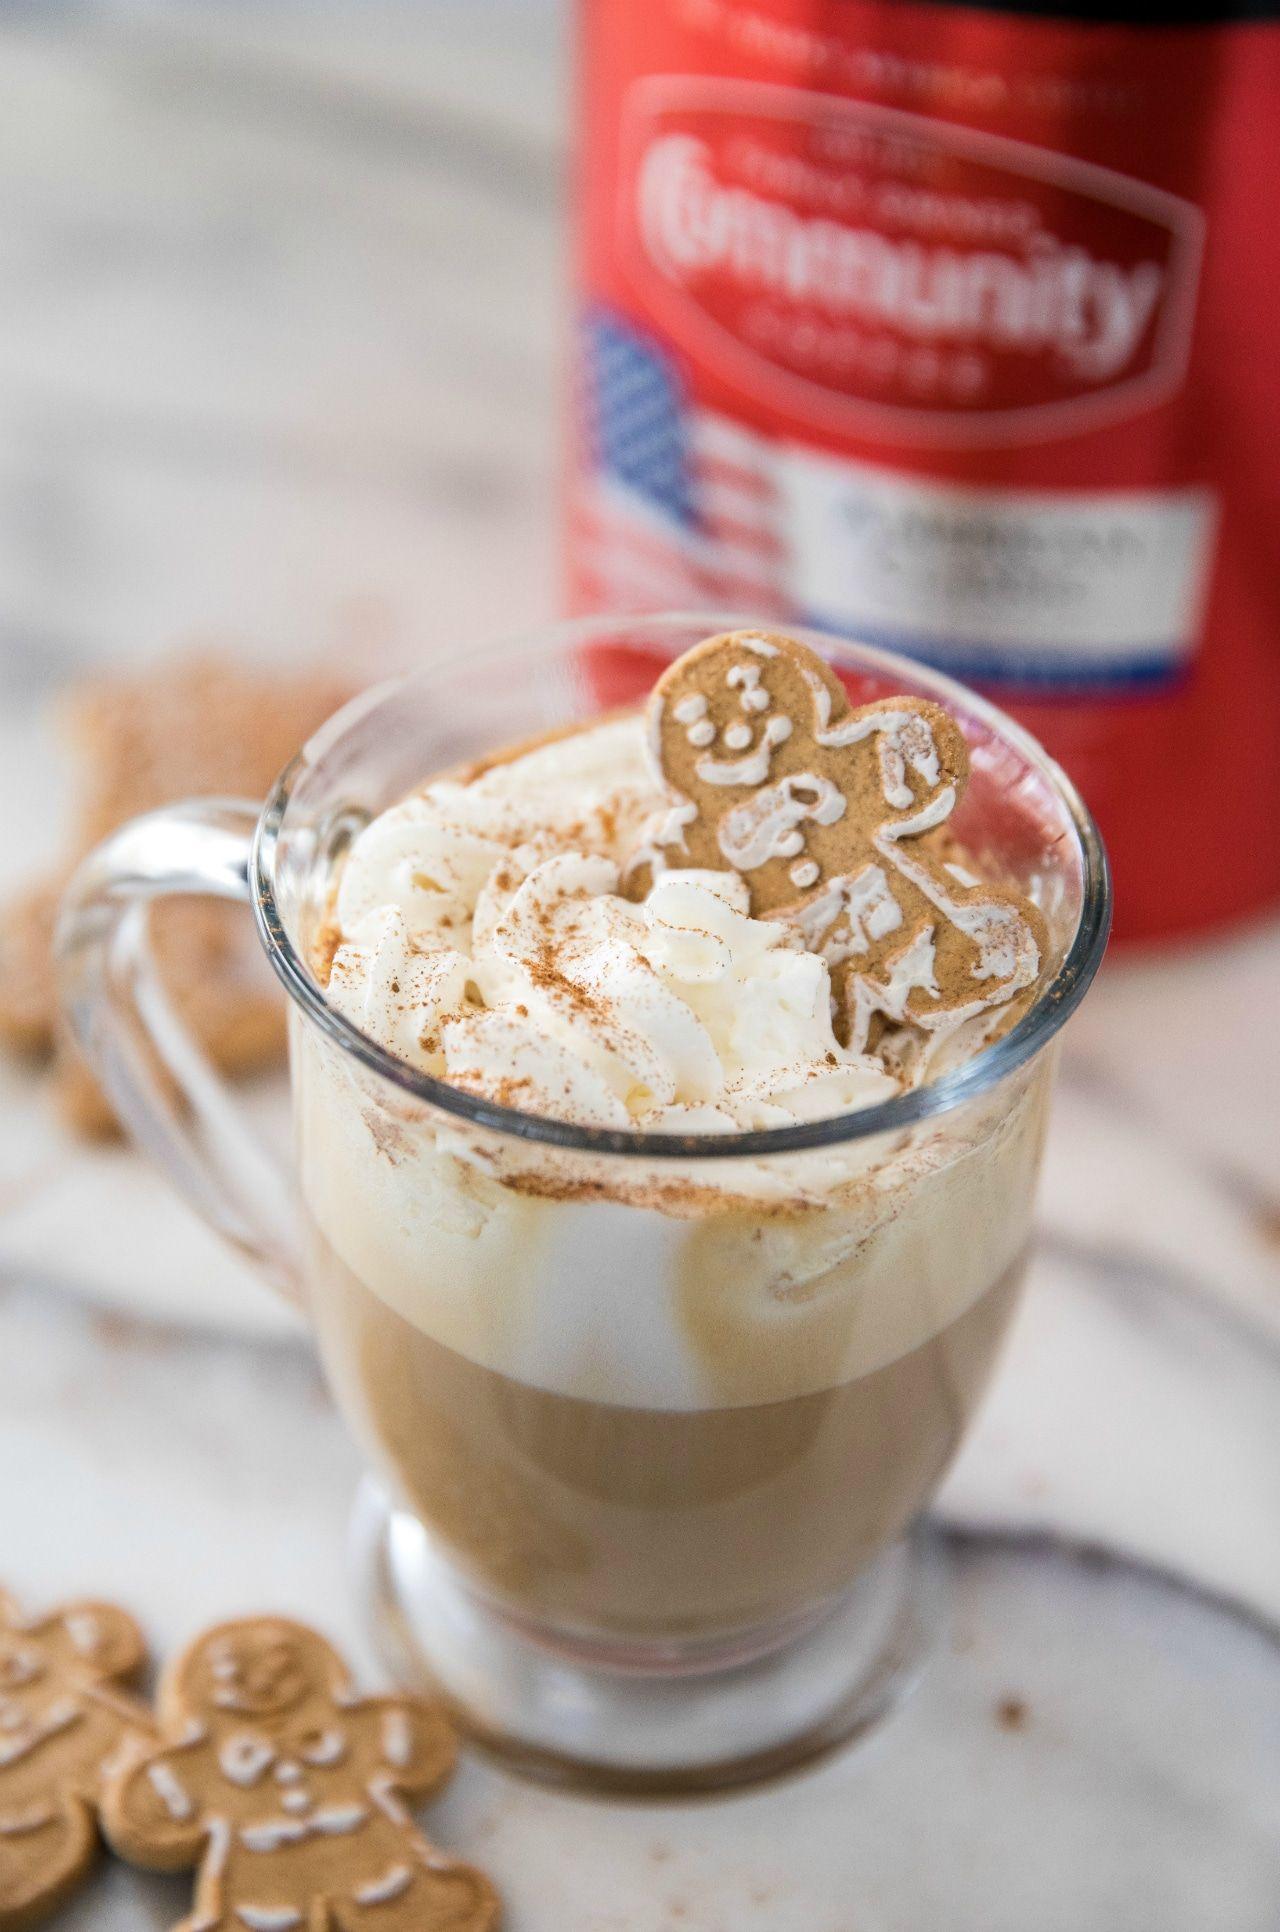 Gingerbread Latte Kim S Cravings In 2020 Healthy Pumpkin Bars Gingerbread Latte Easy Sugar Cookies